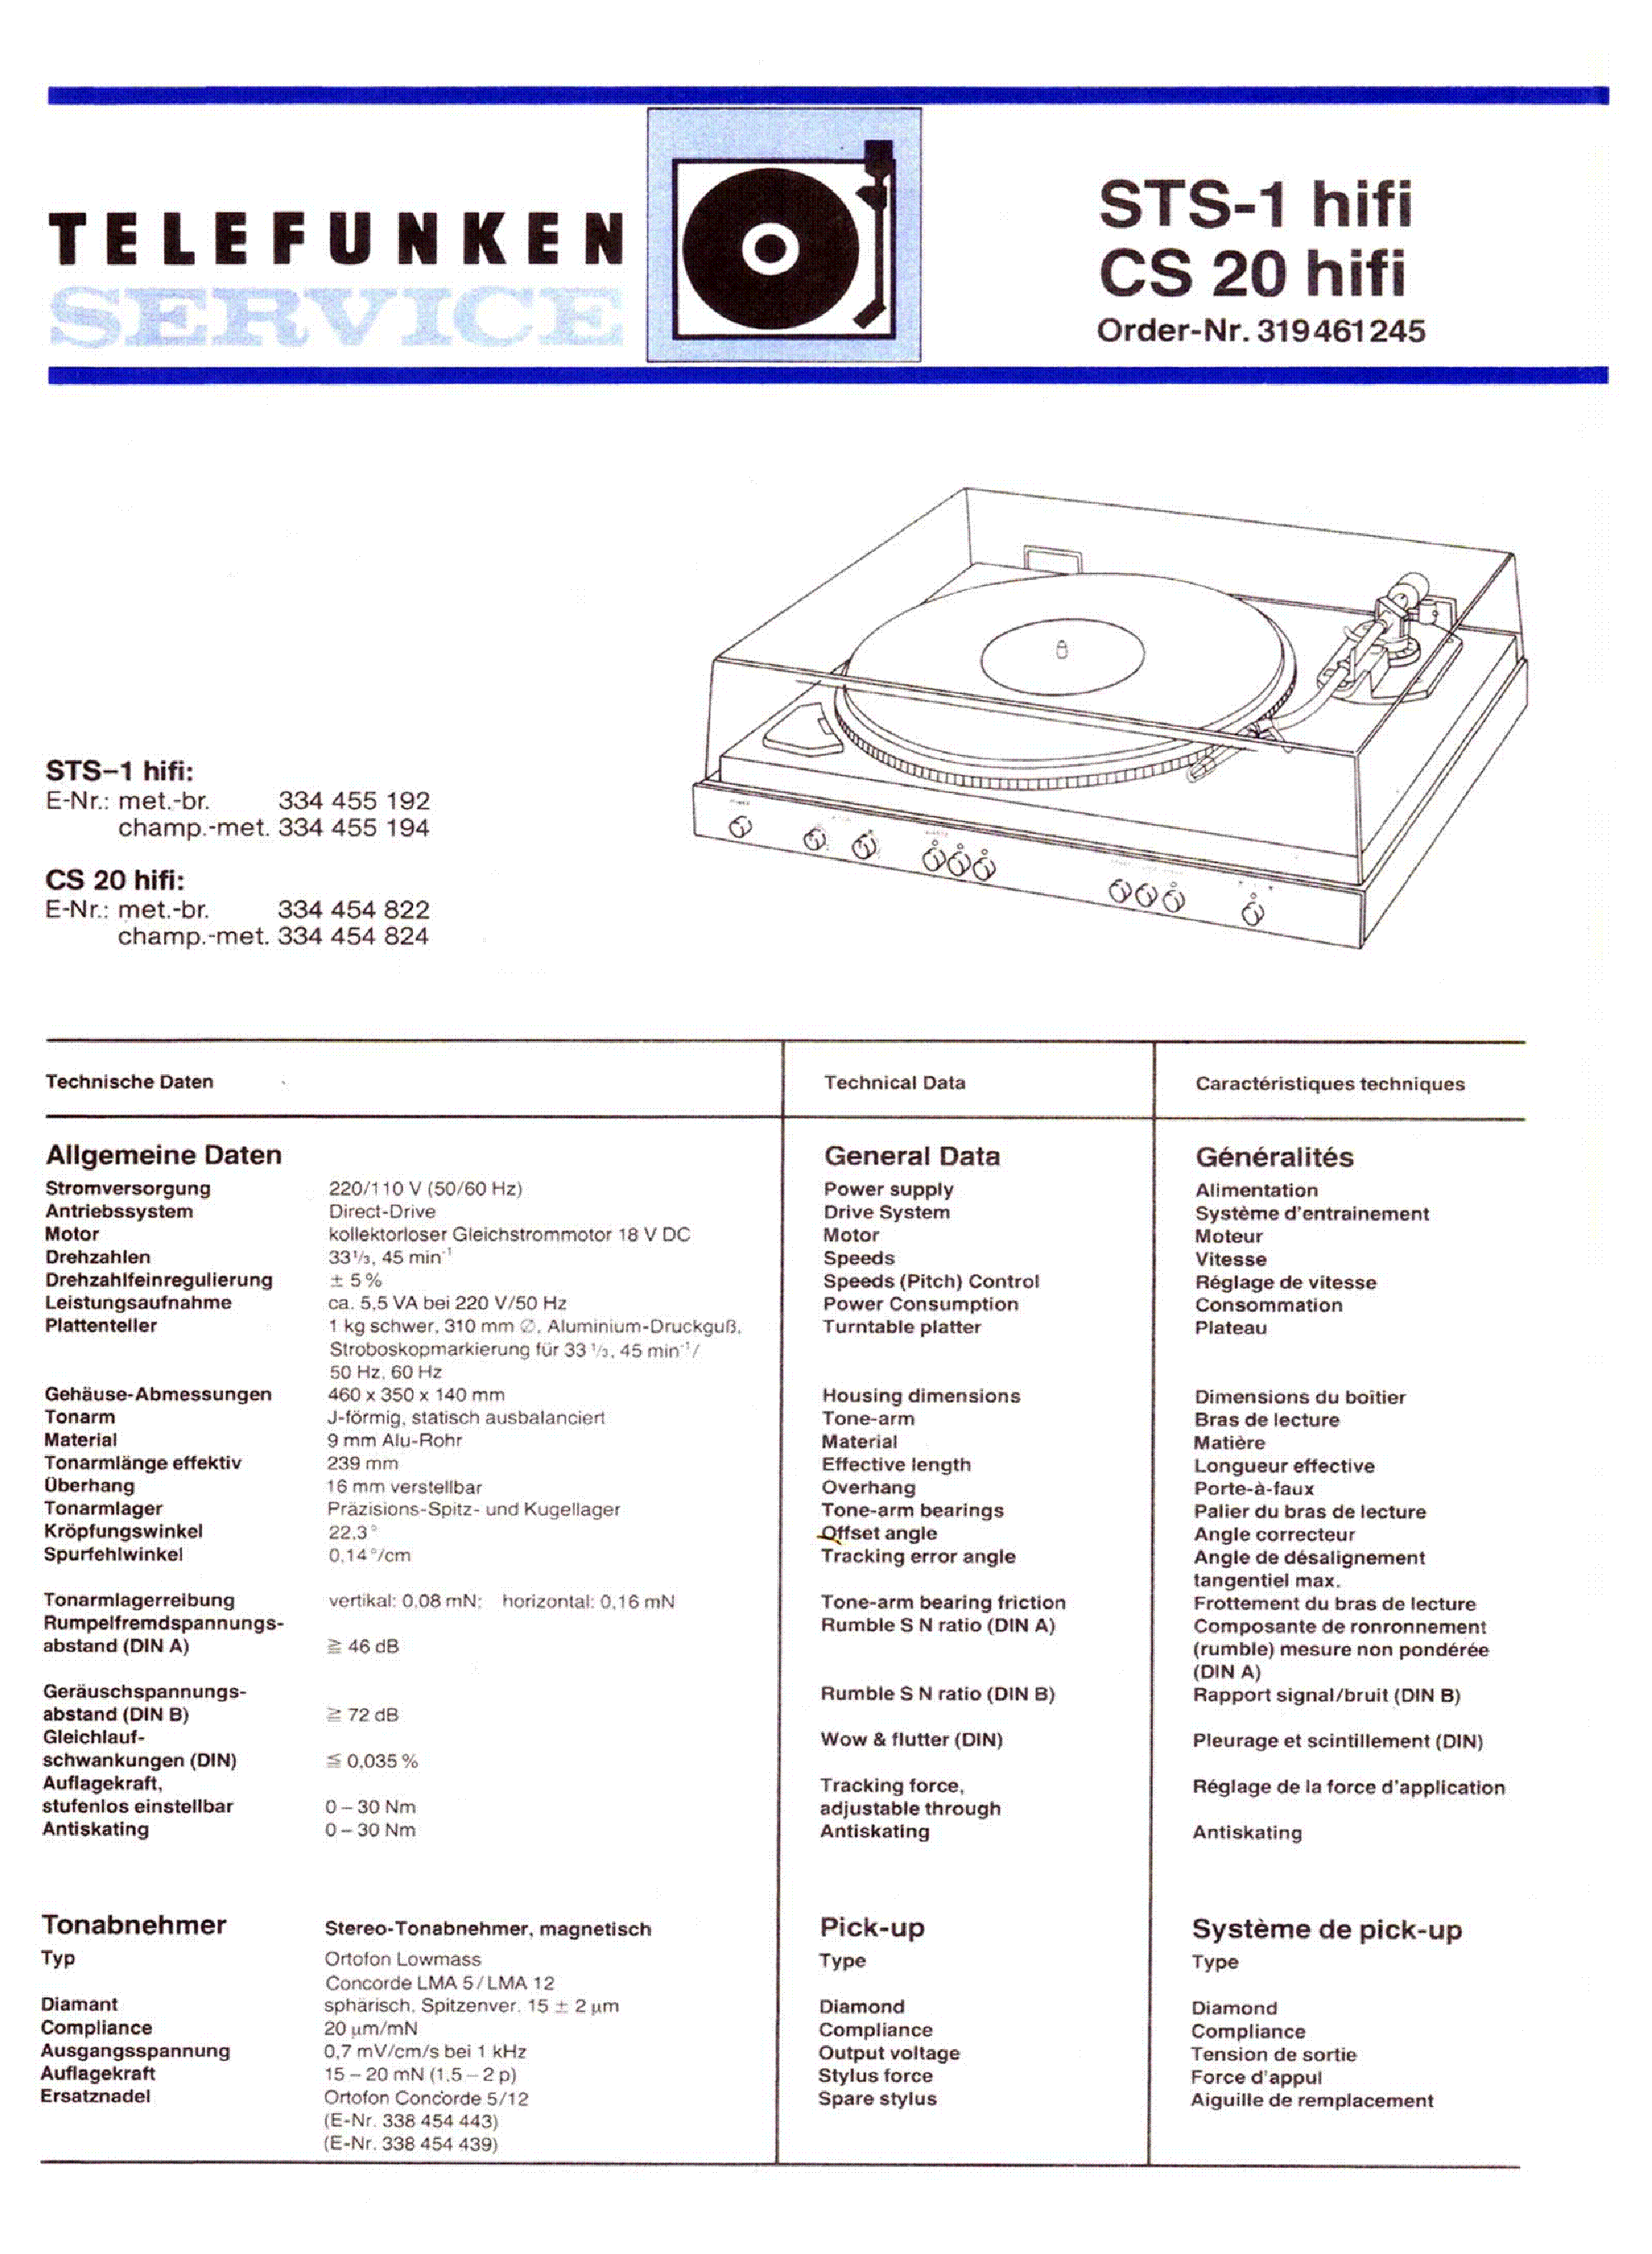 TELEFUNKEN STS-1 CS20 HIFI TURNTABLE Service Manual download